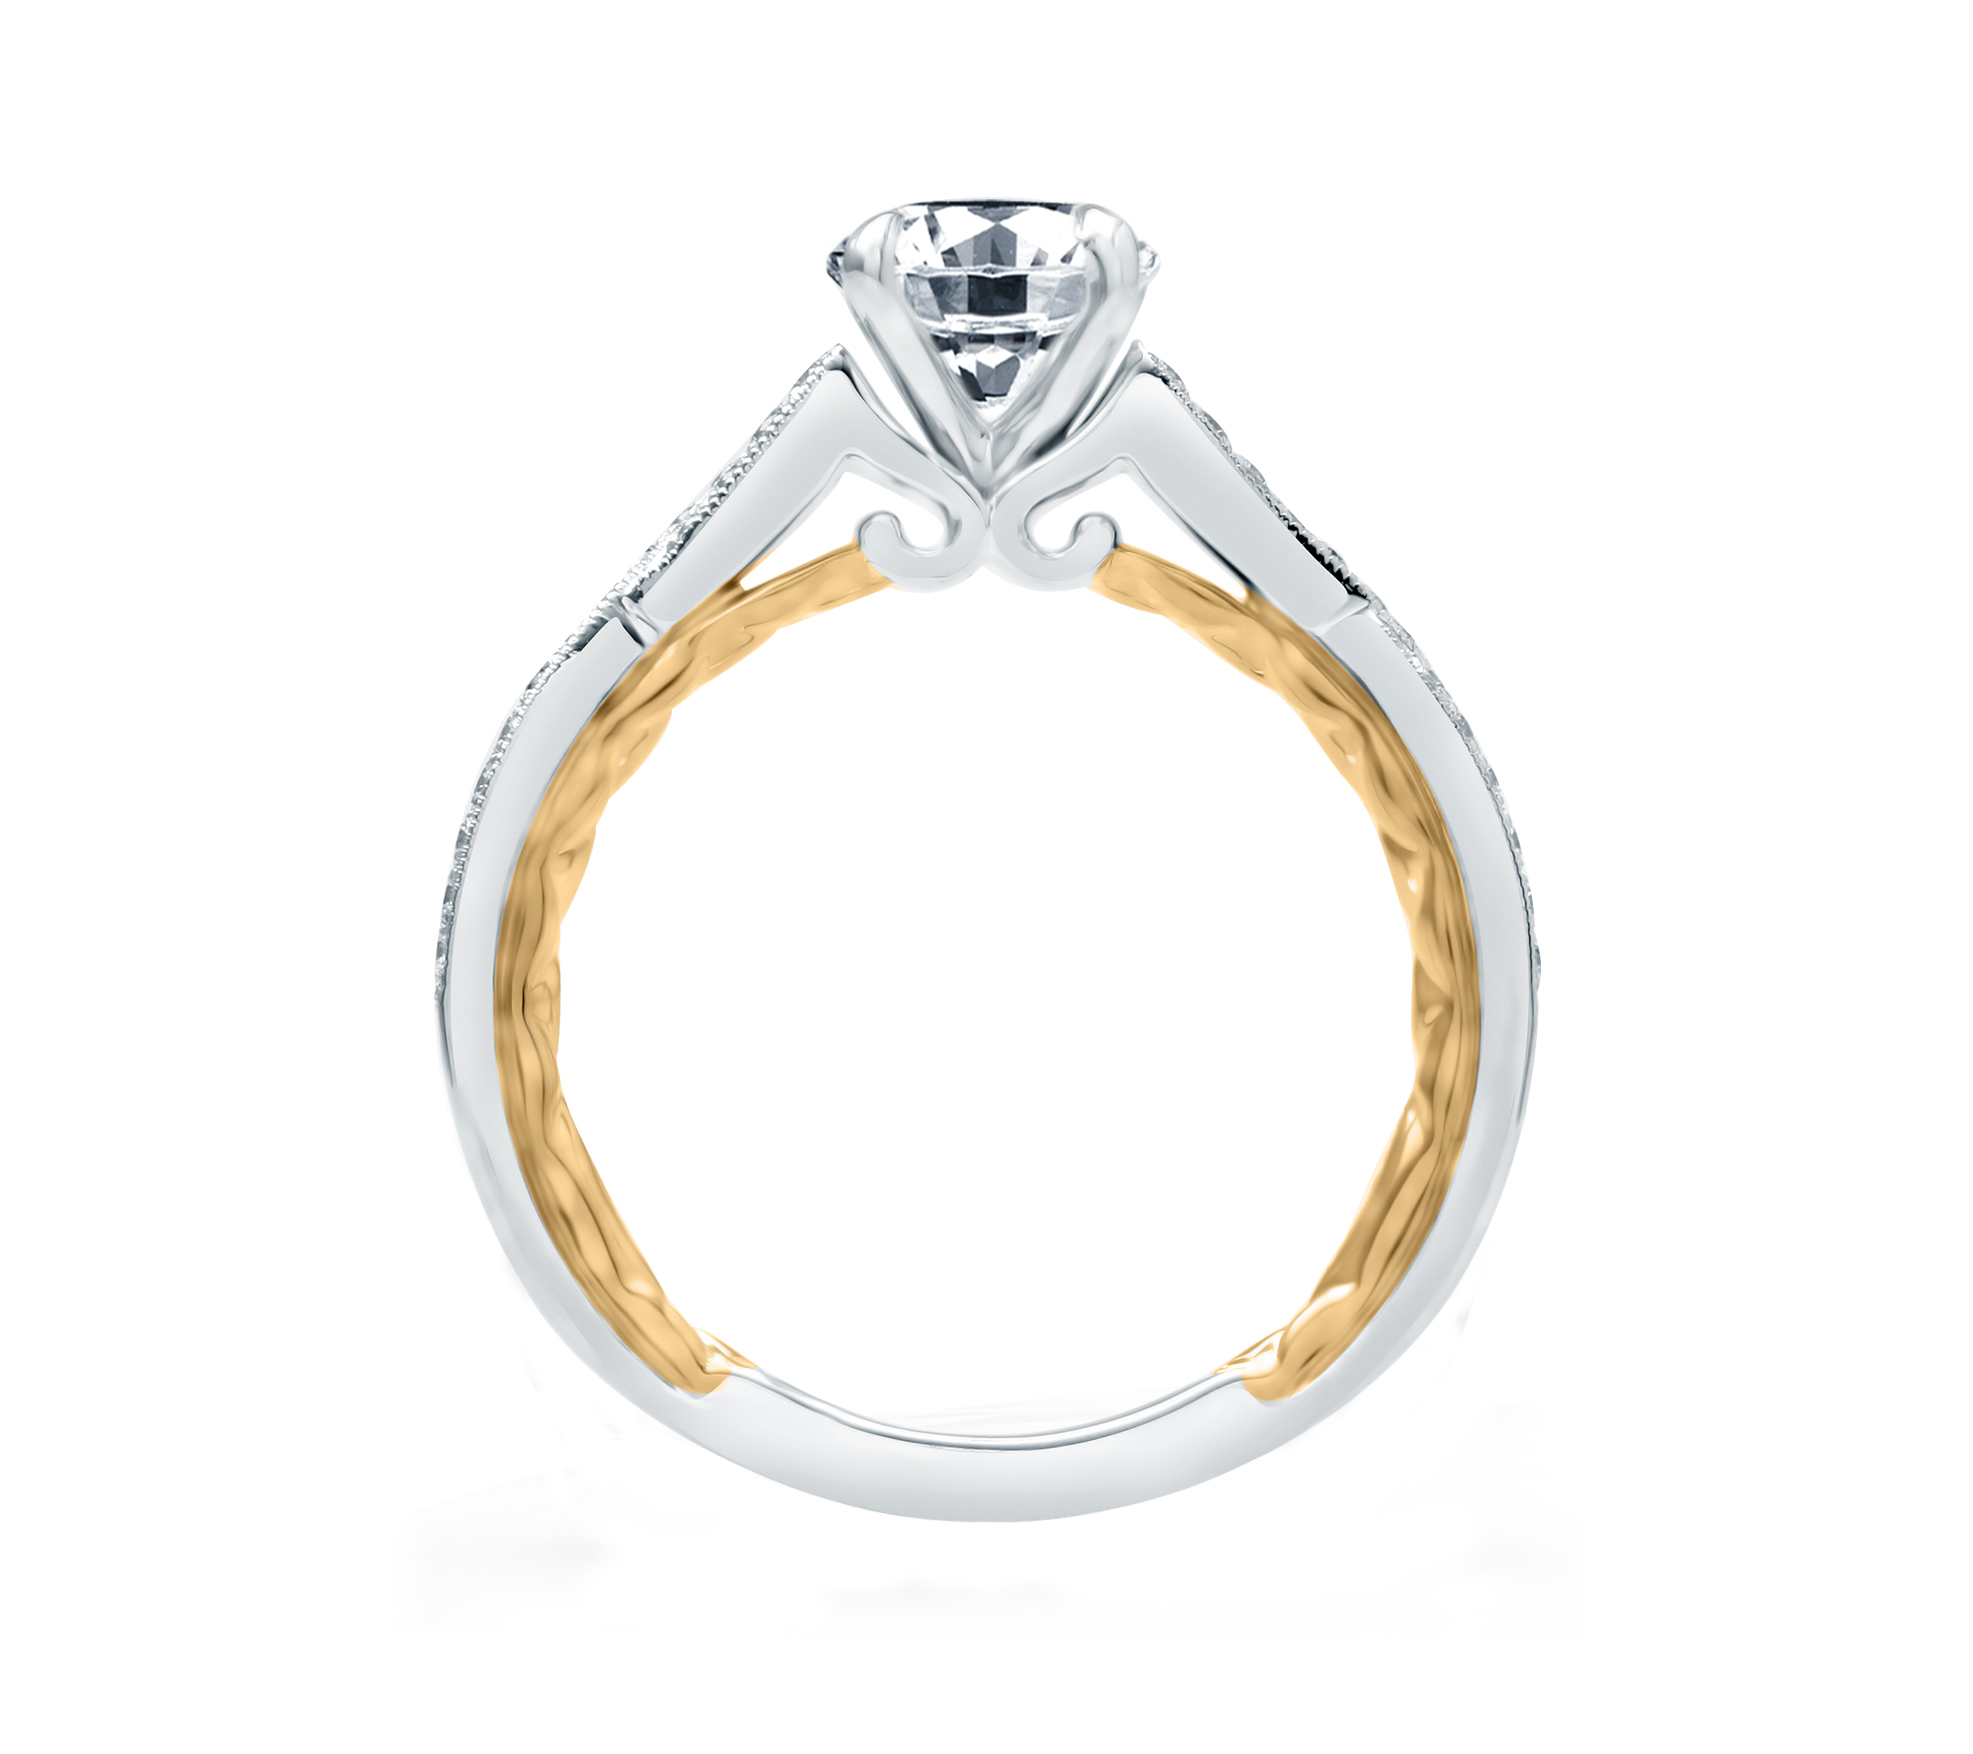 A.Jaffe Rings | Camarillo Jewelers | Van Gundys